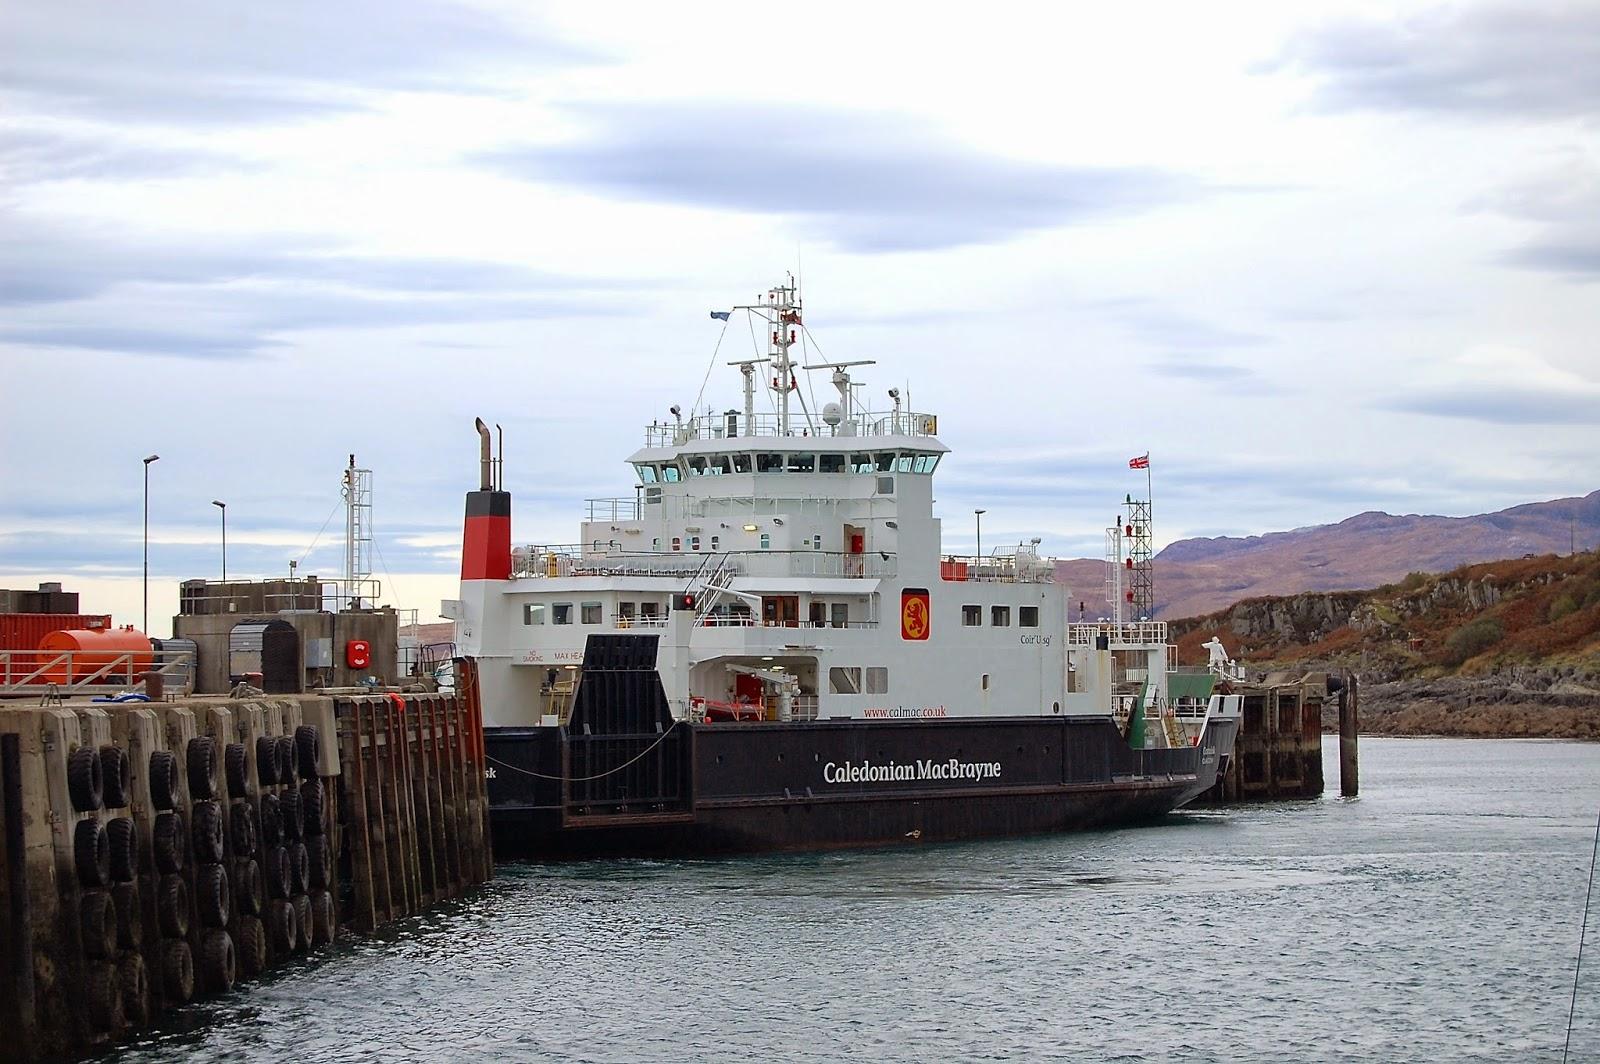 Caledonian MacBrayne ferry boat in Mallaig